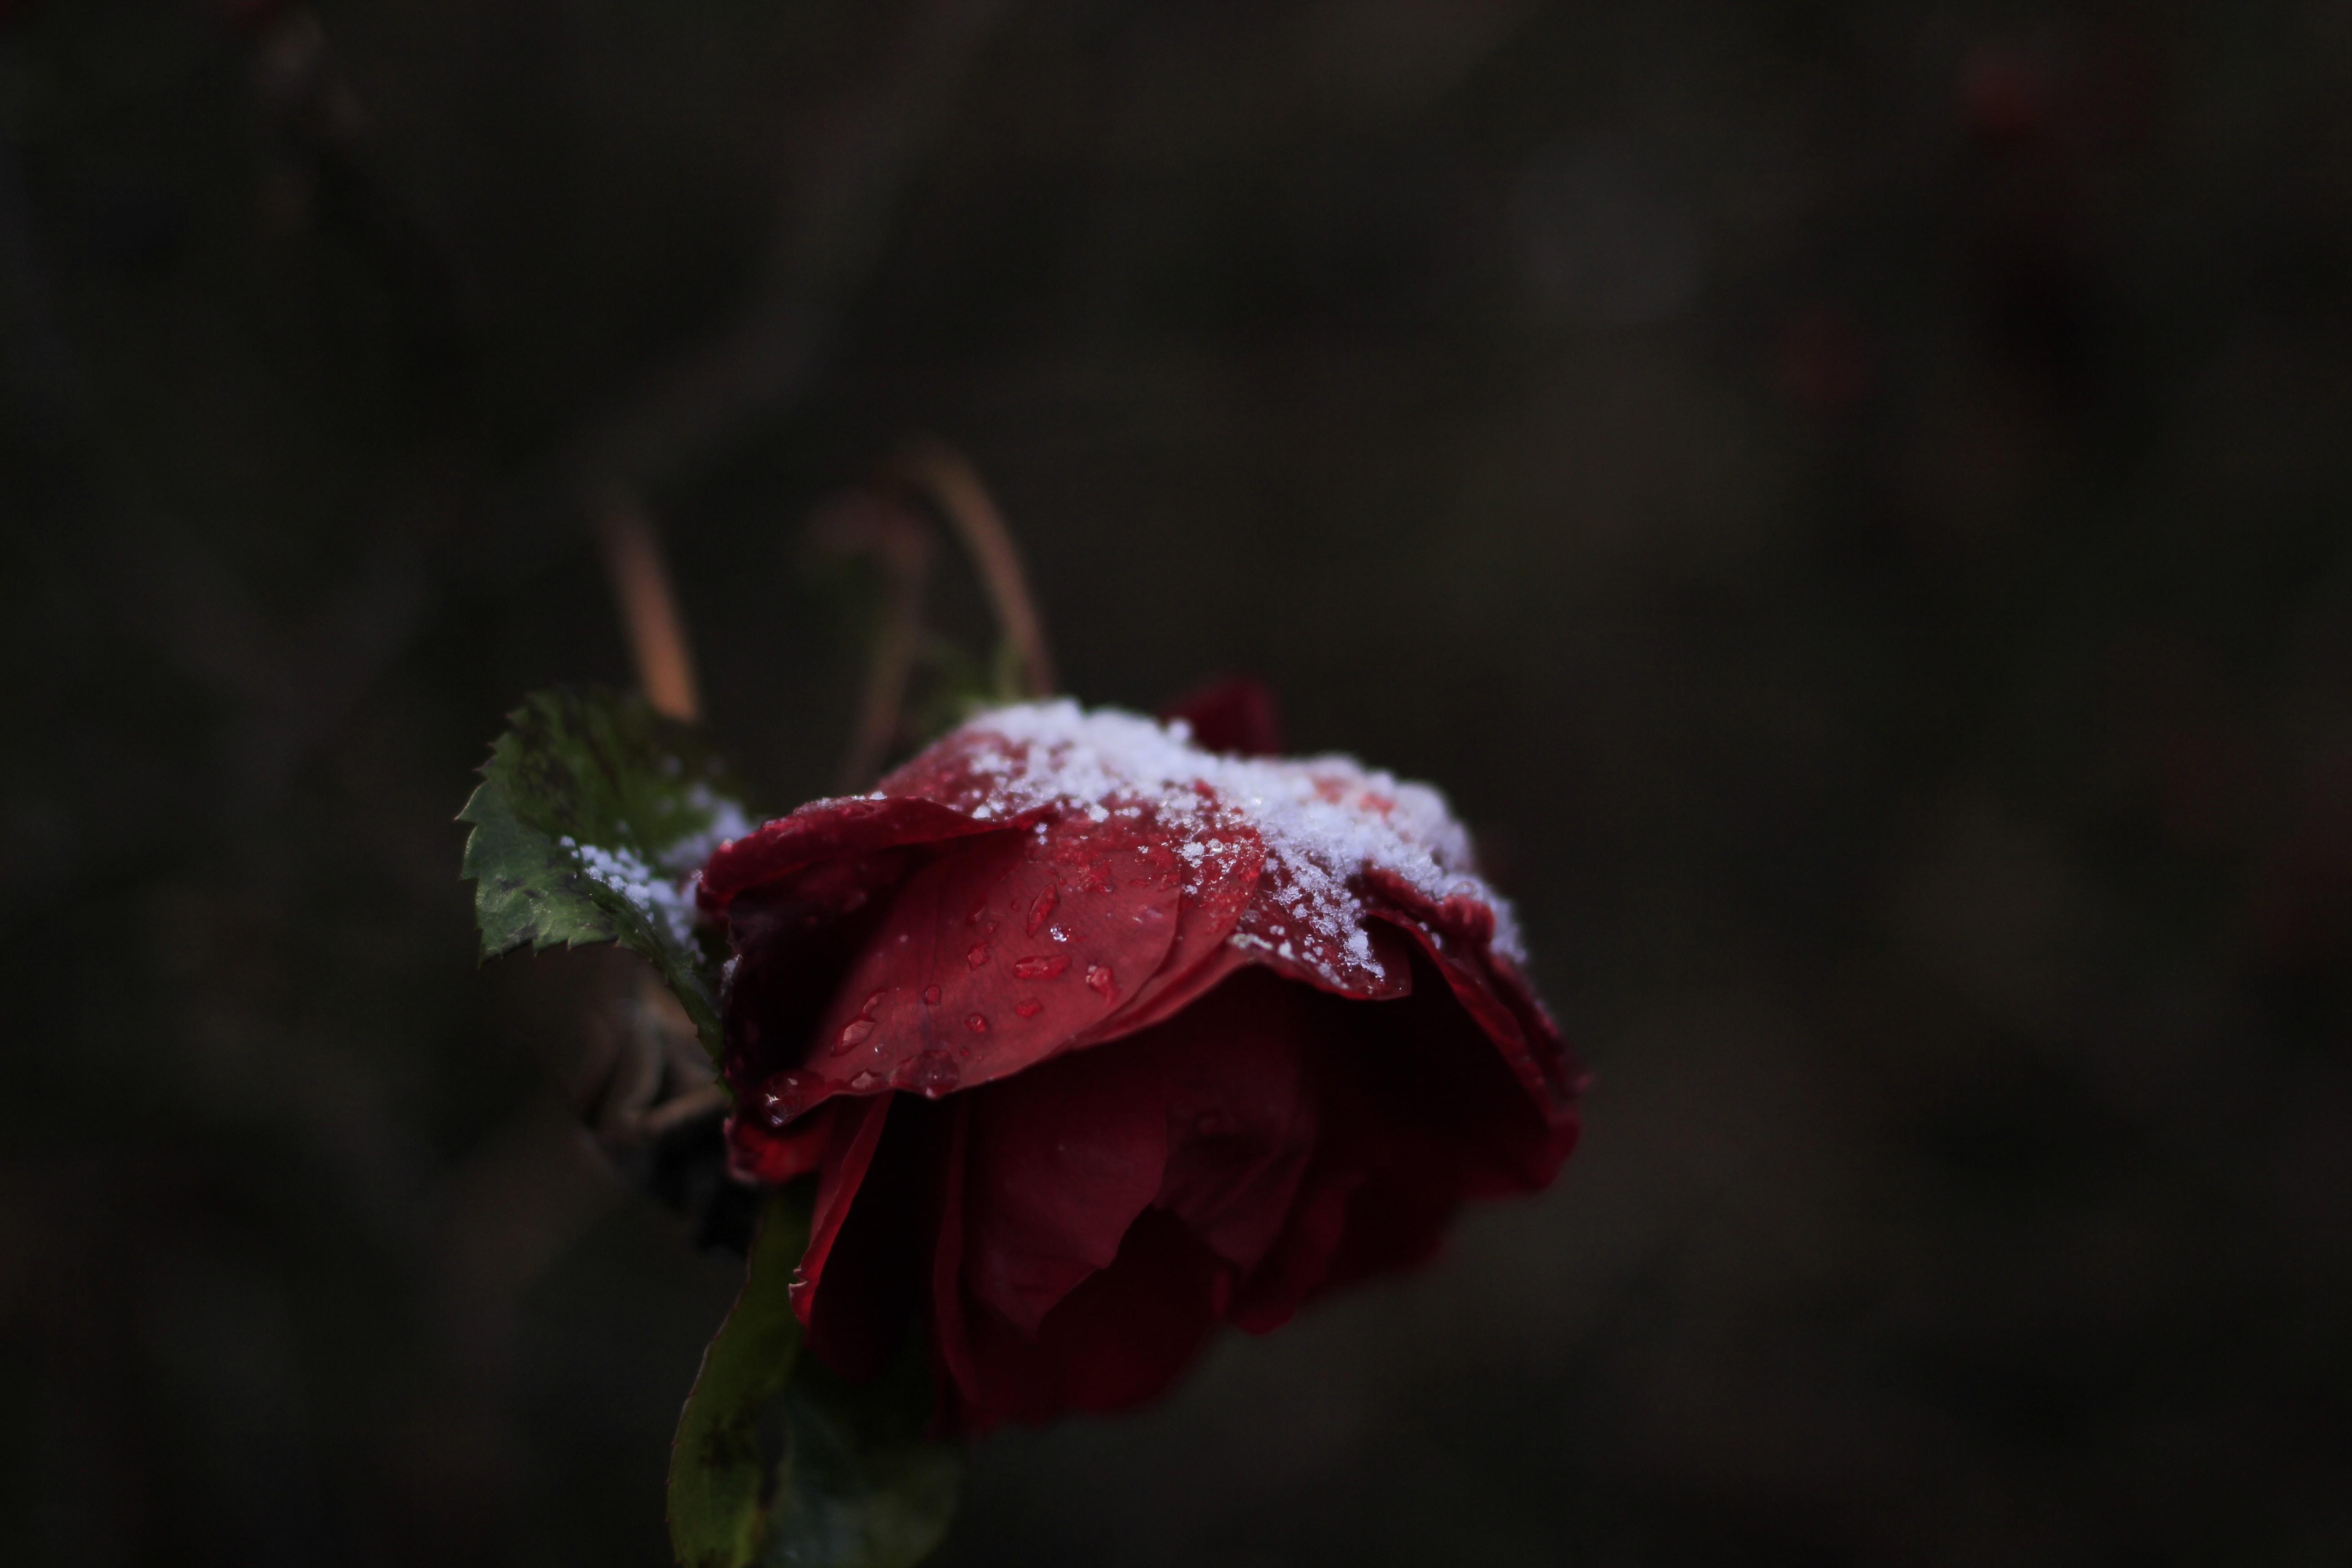 snow powders on red rose flower